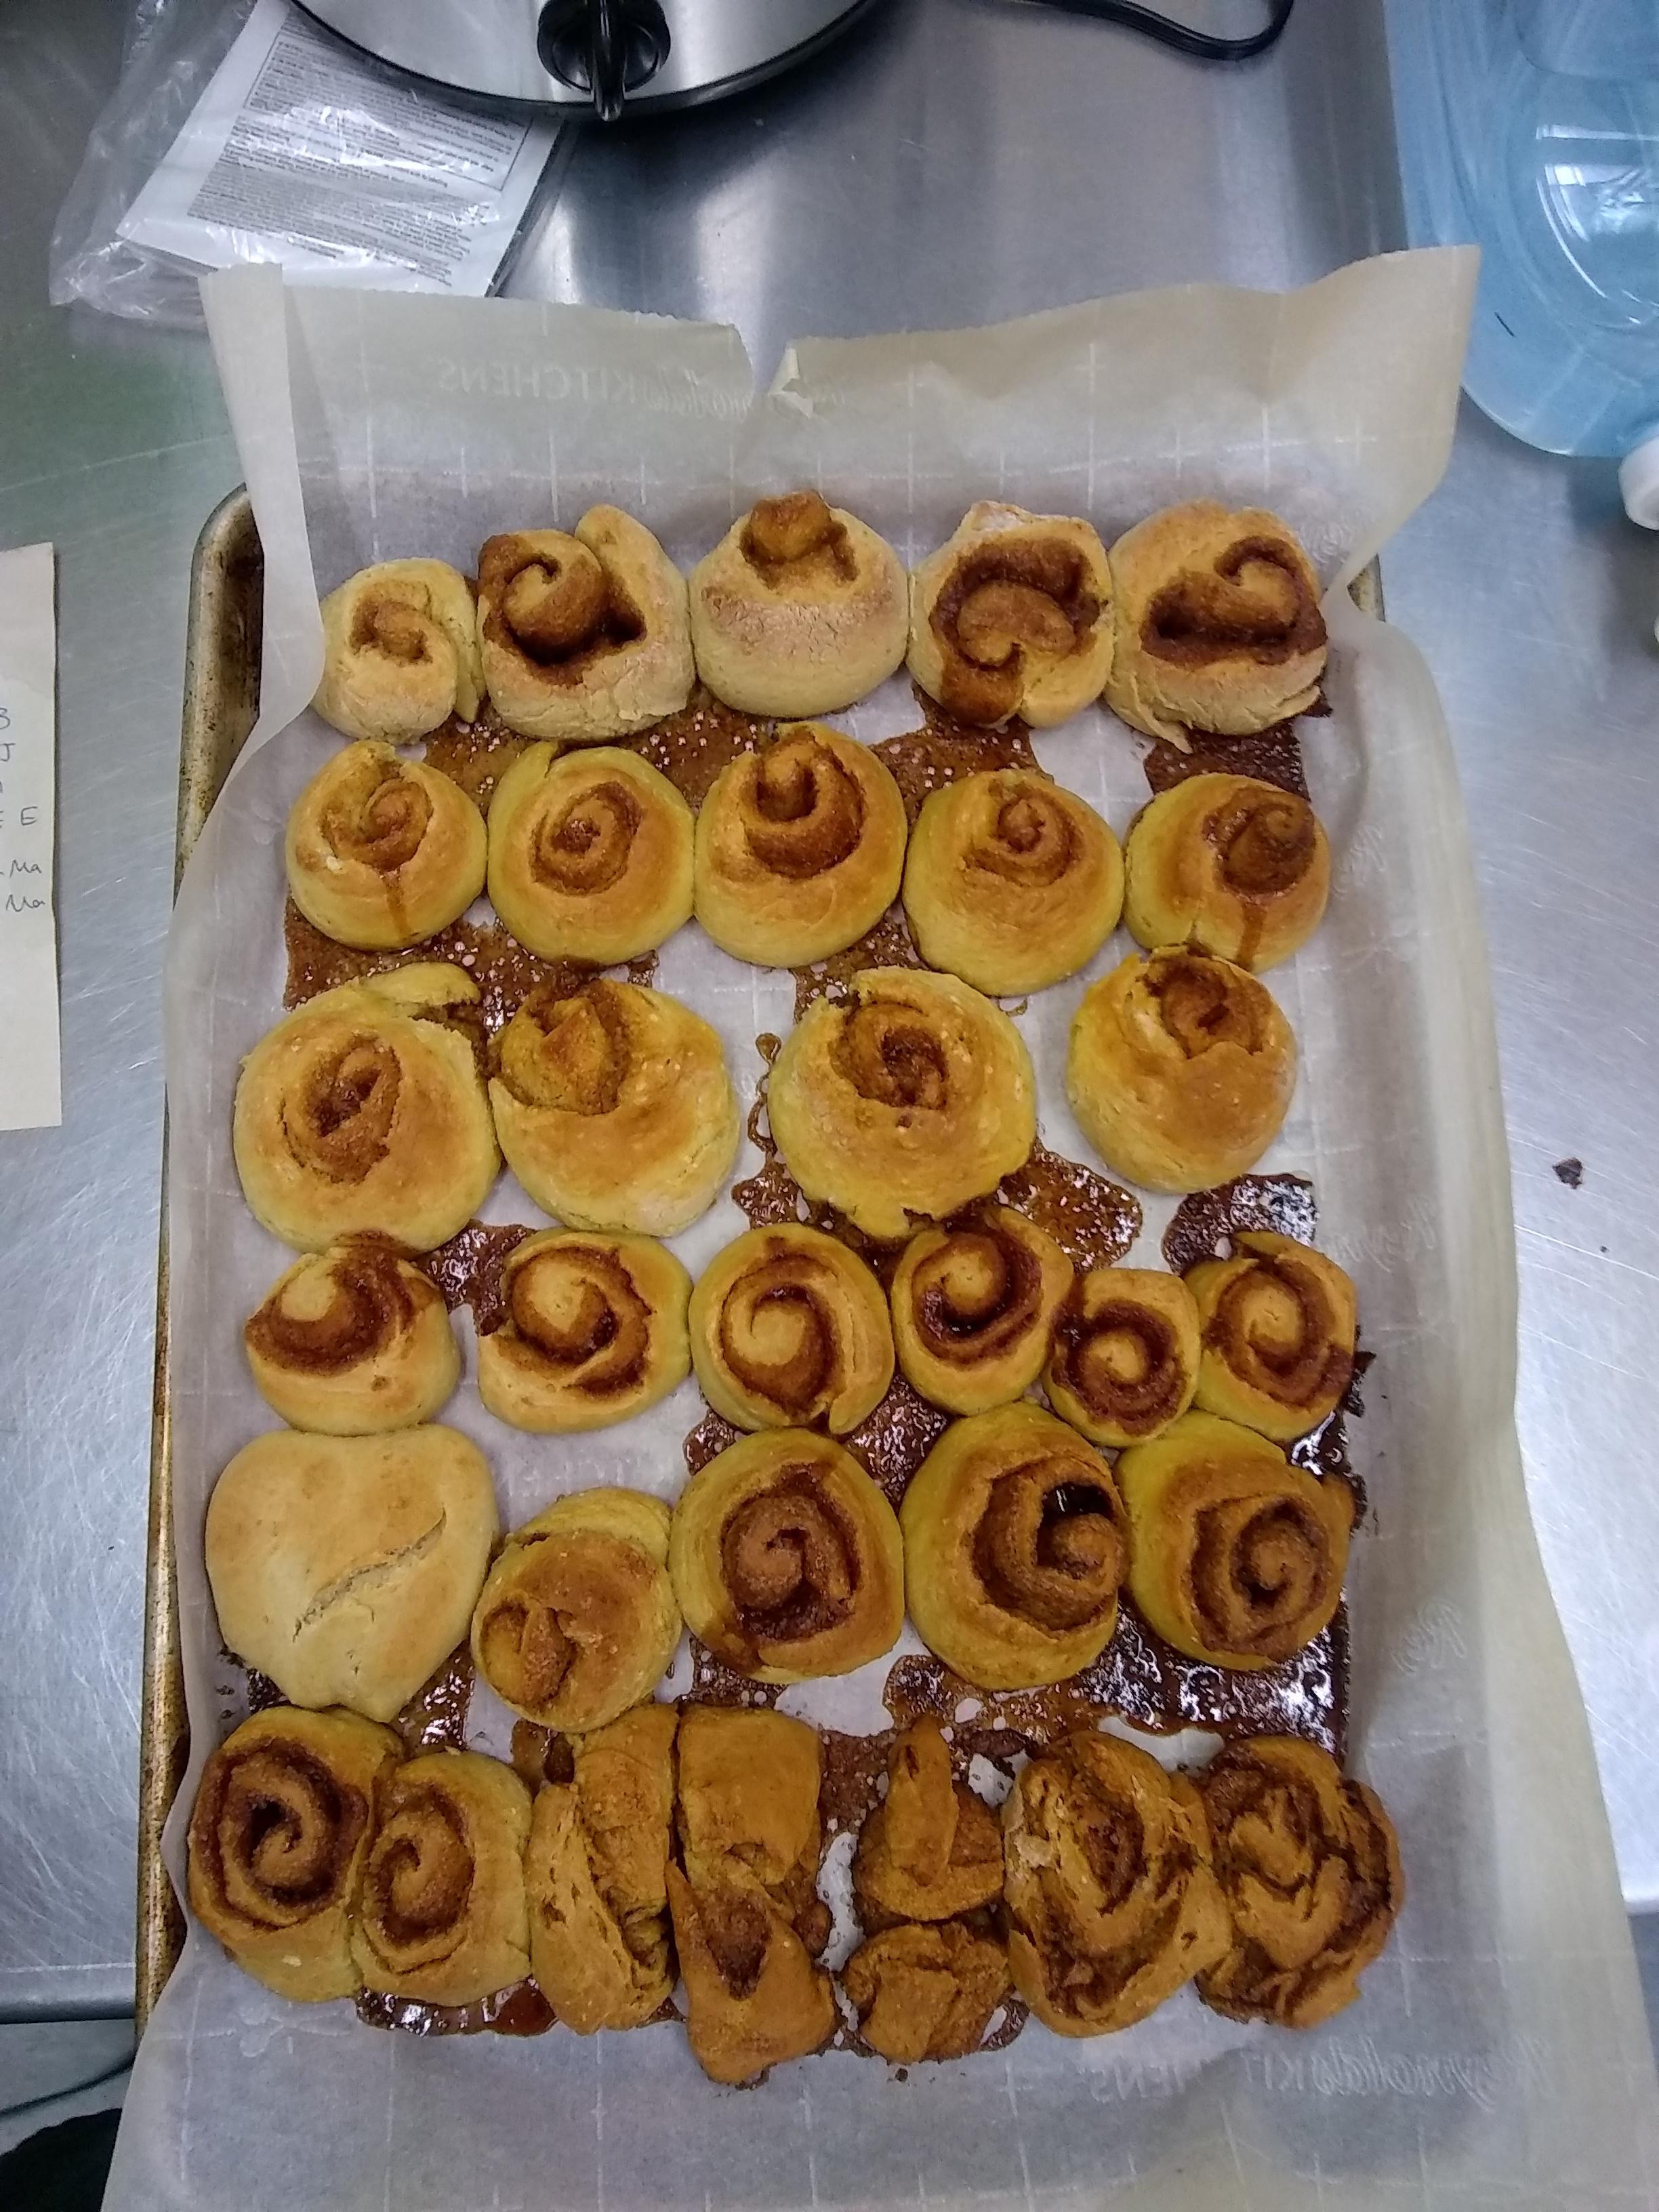 finished cinnamon rolls